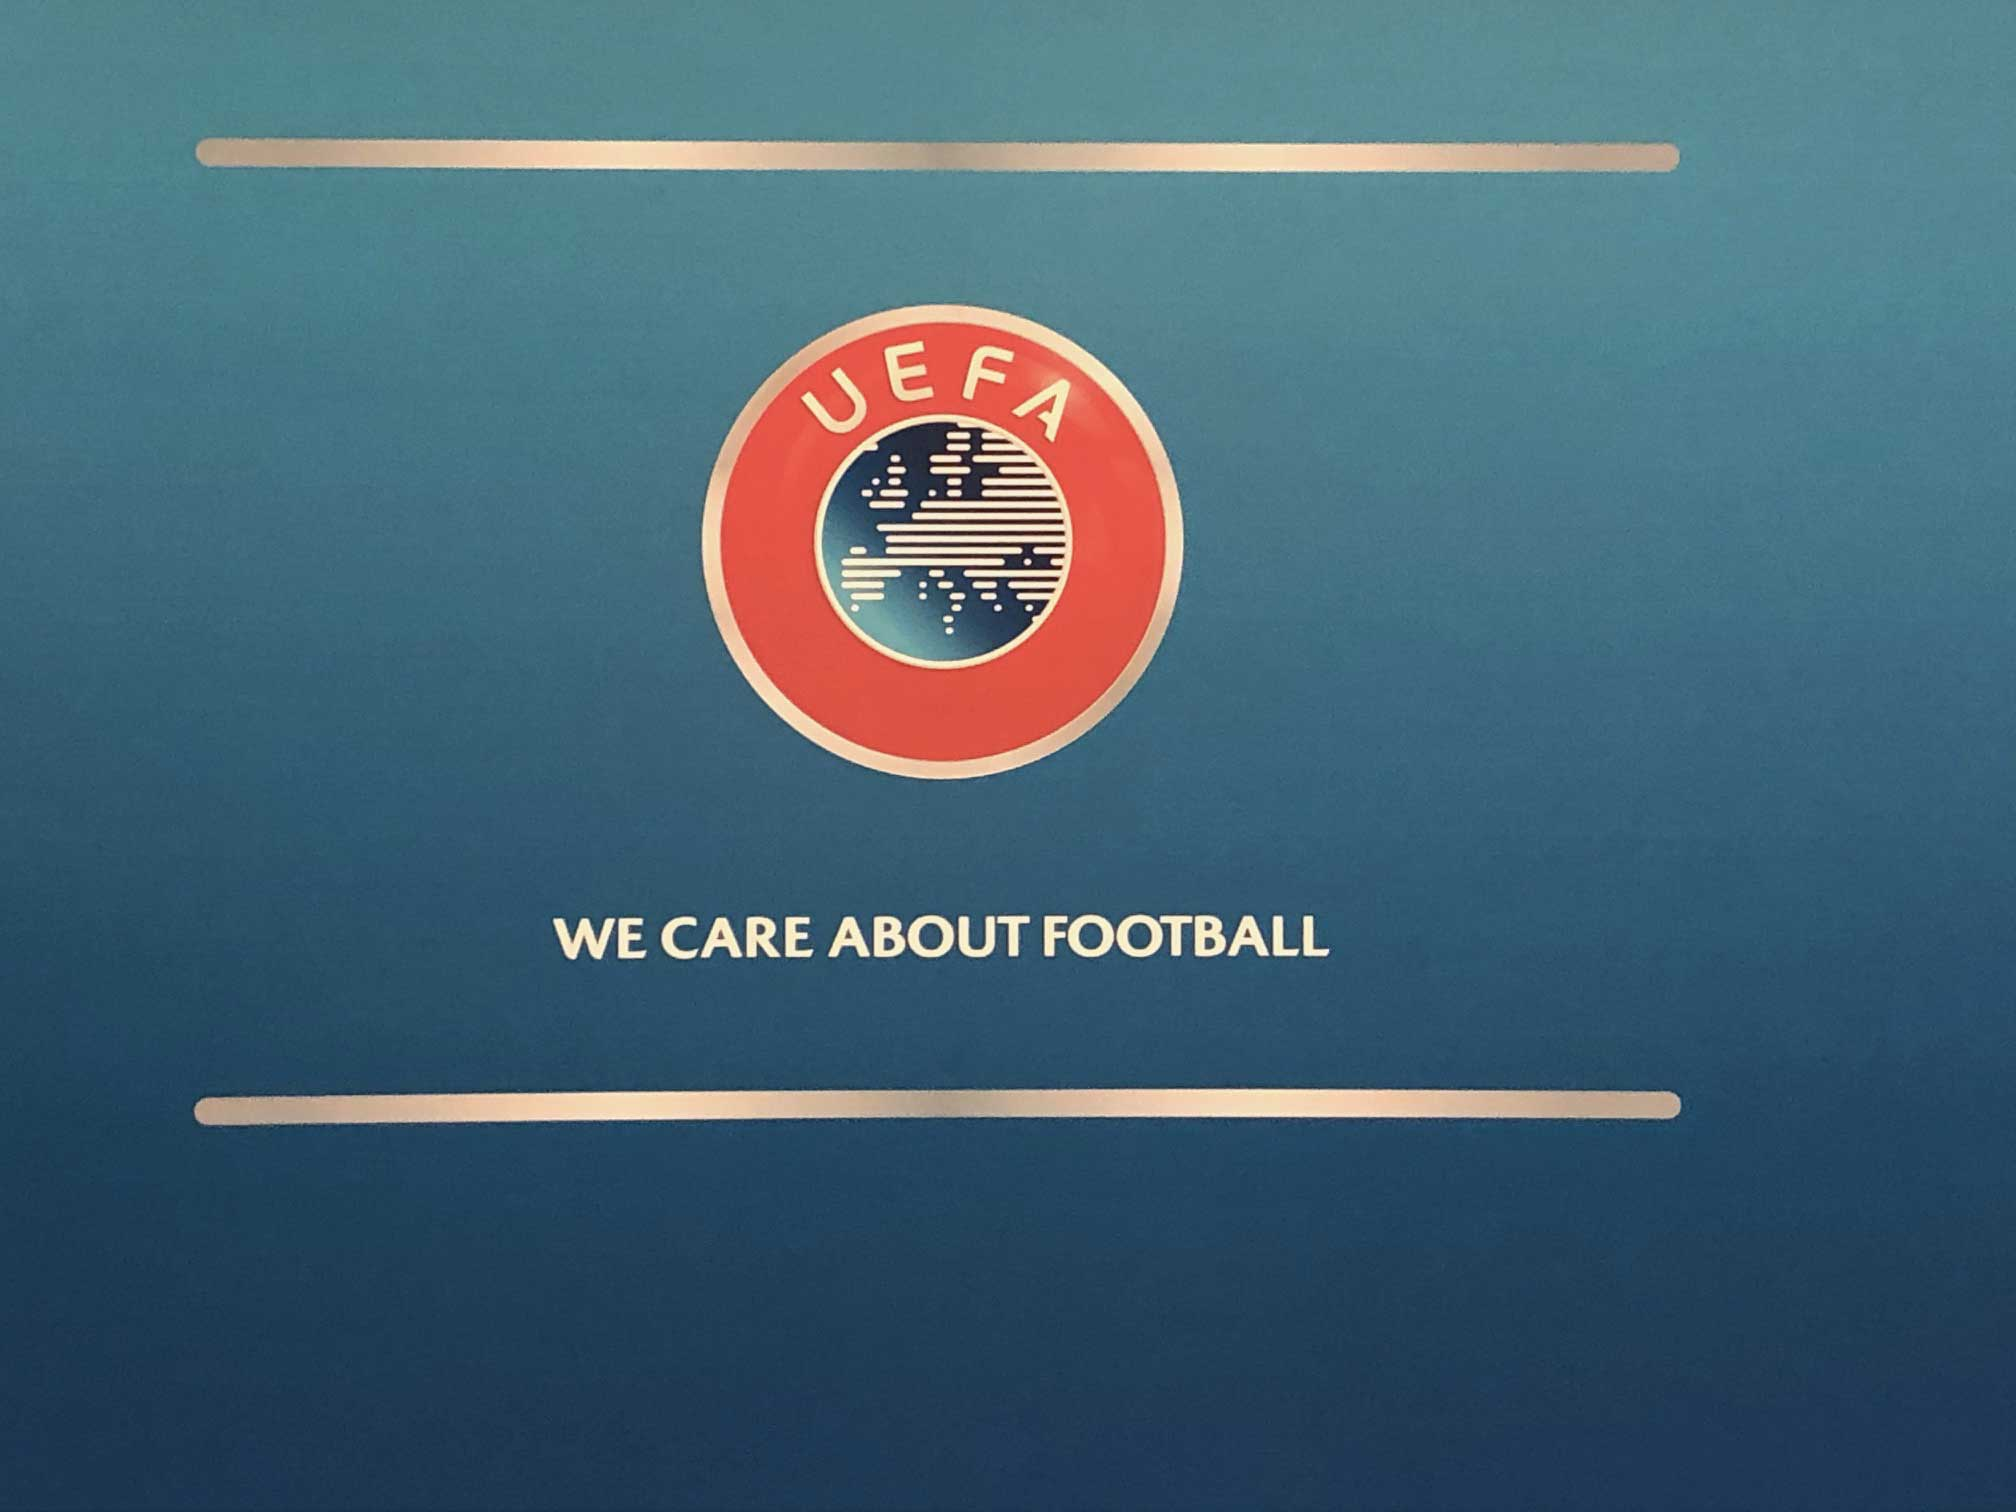 UEFA wecareaboutfootball